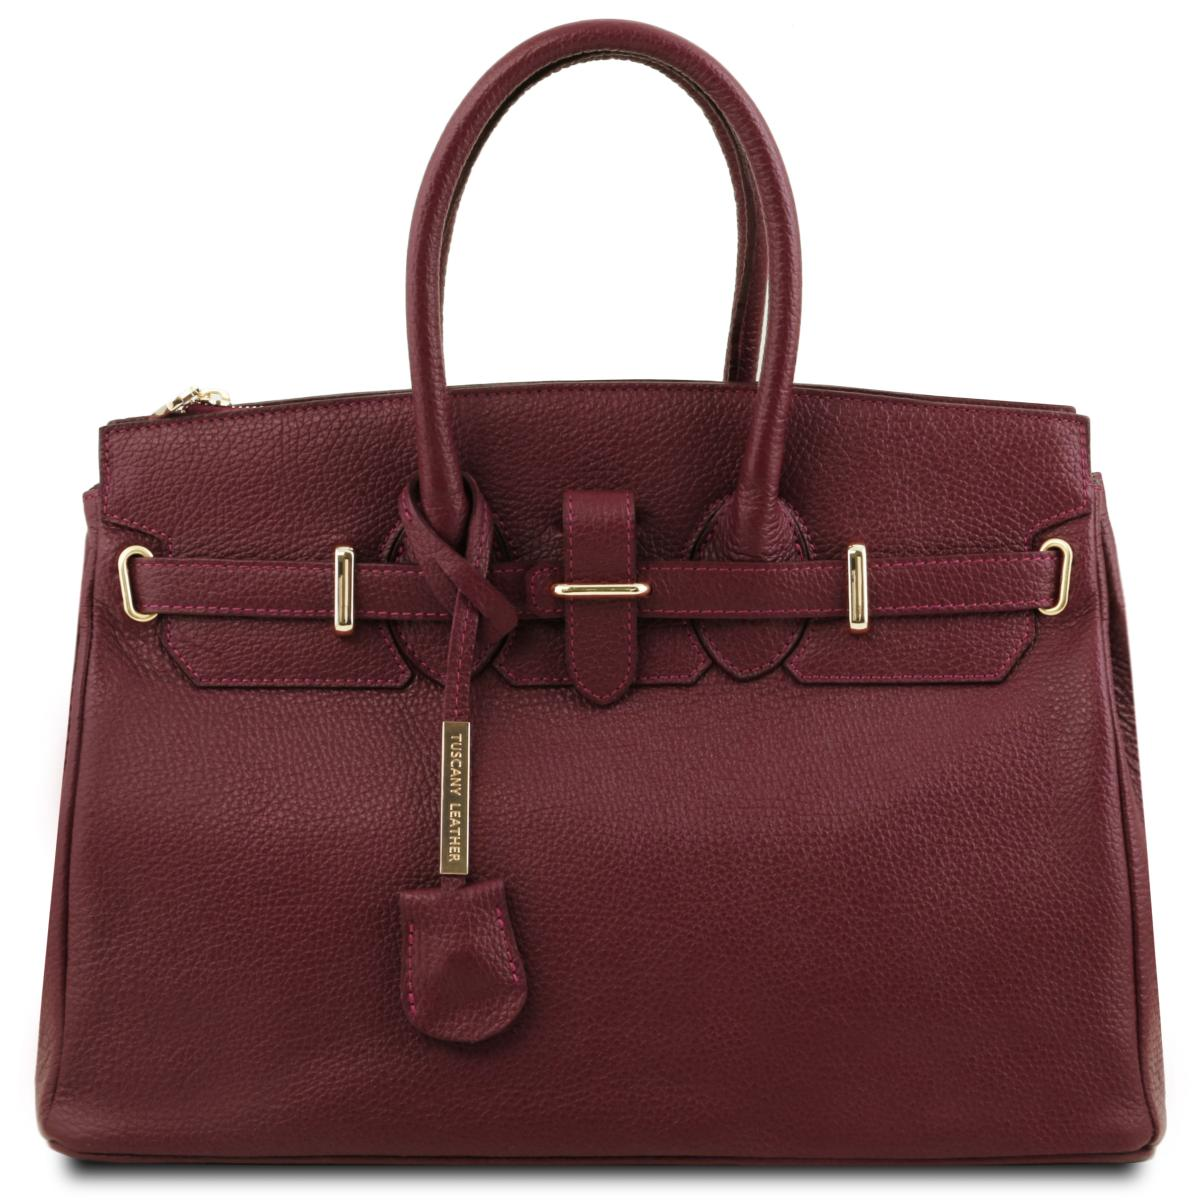 sac cuir femme avec sangle tuscany leather. Black Bedroom Furniture Sets. Home Design Ideas